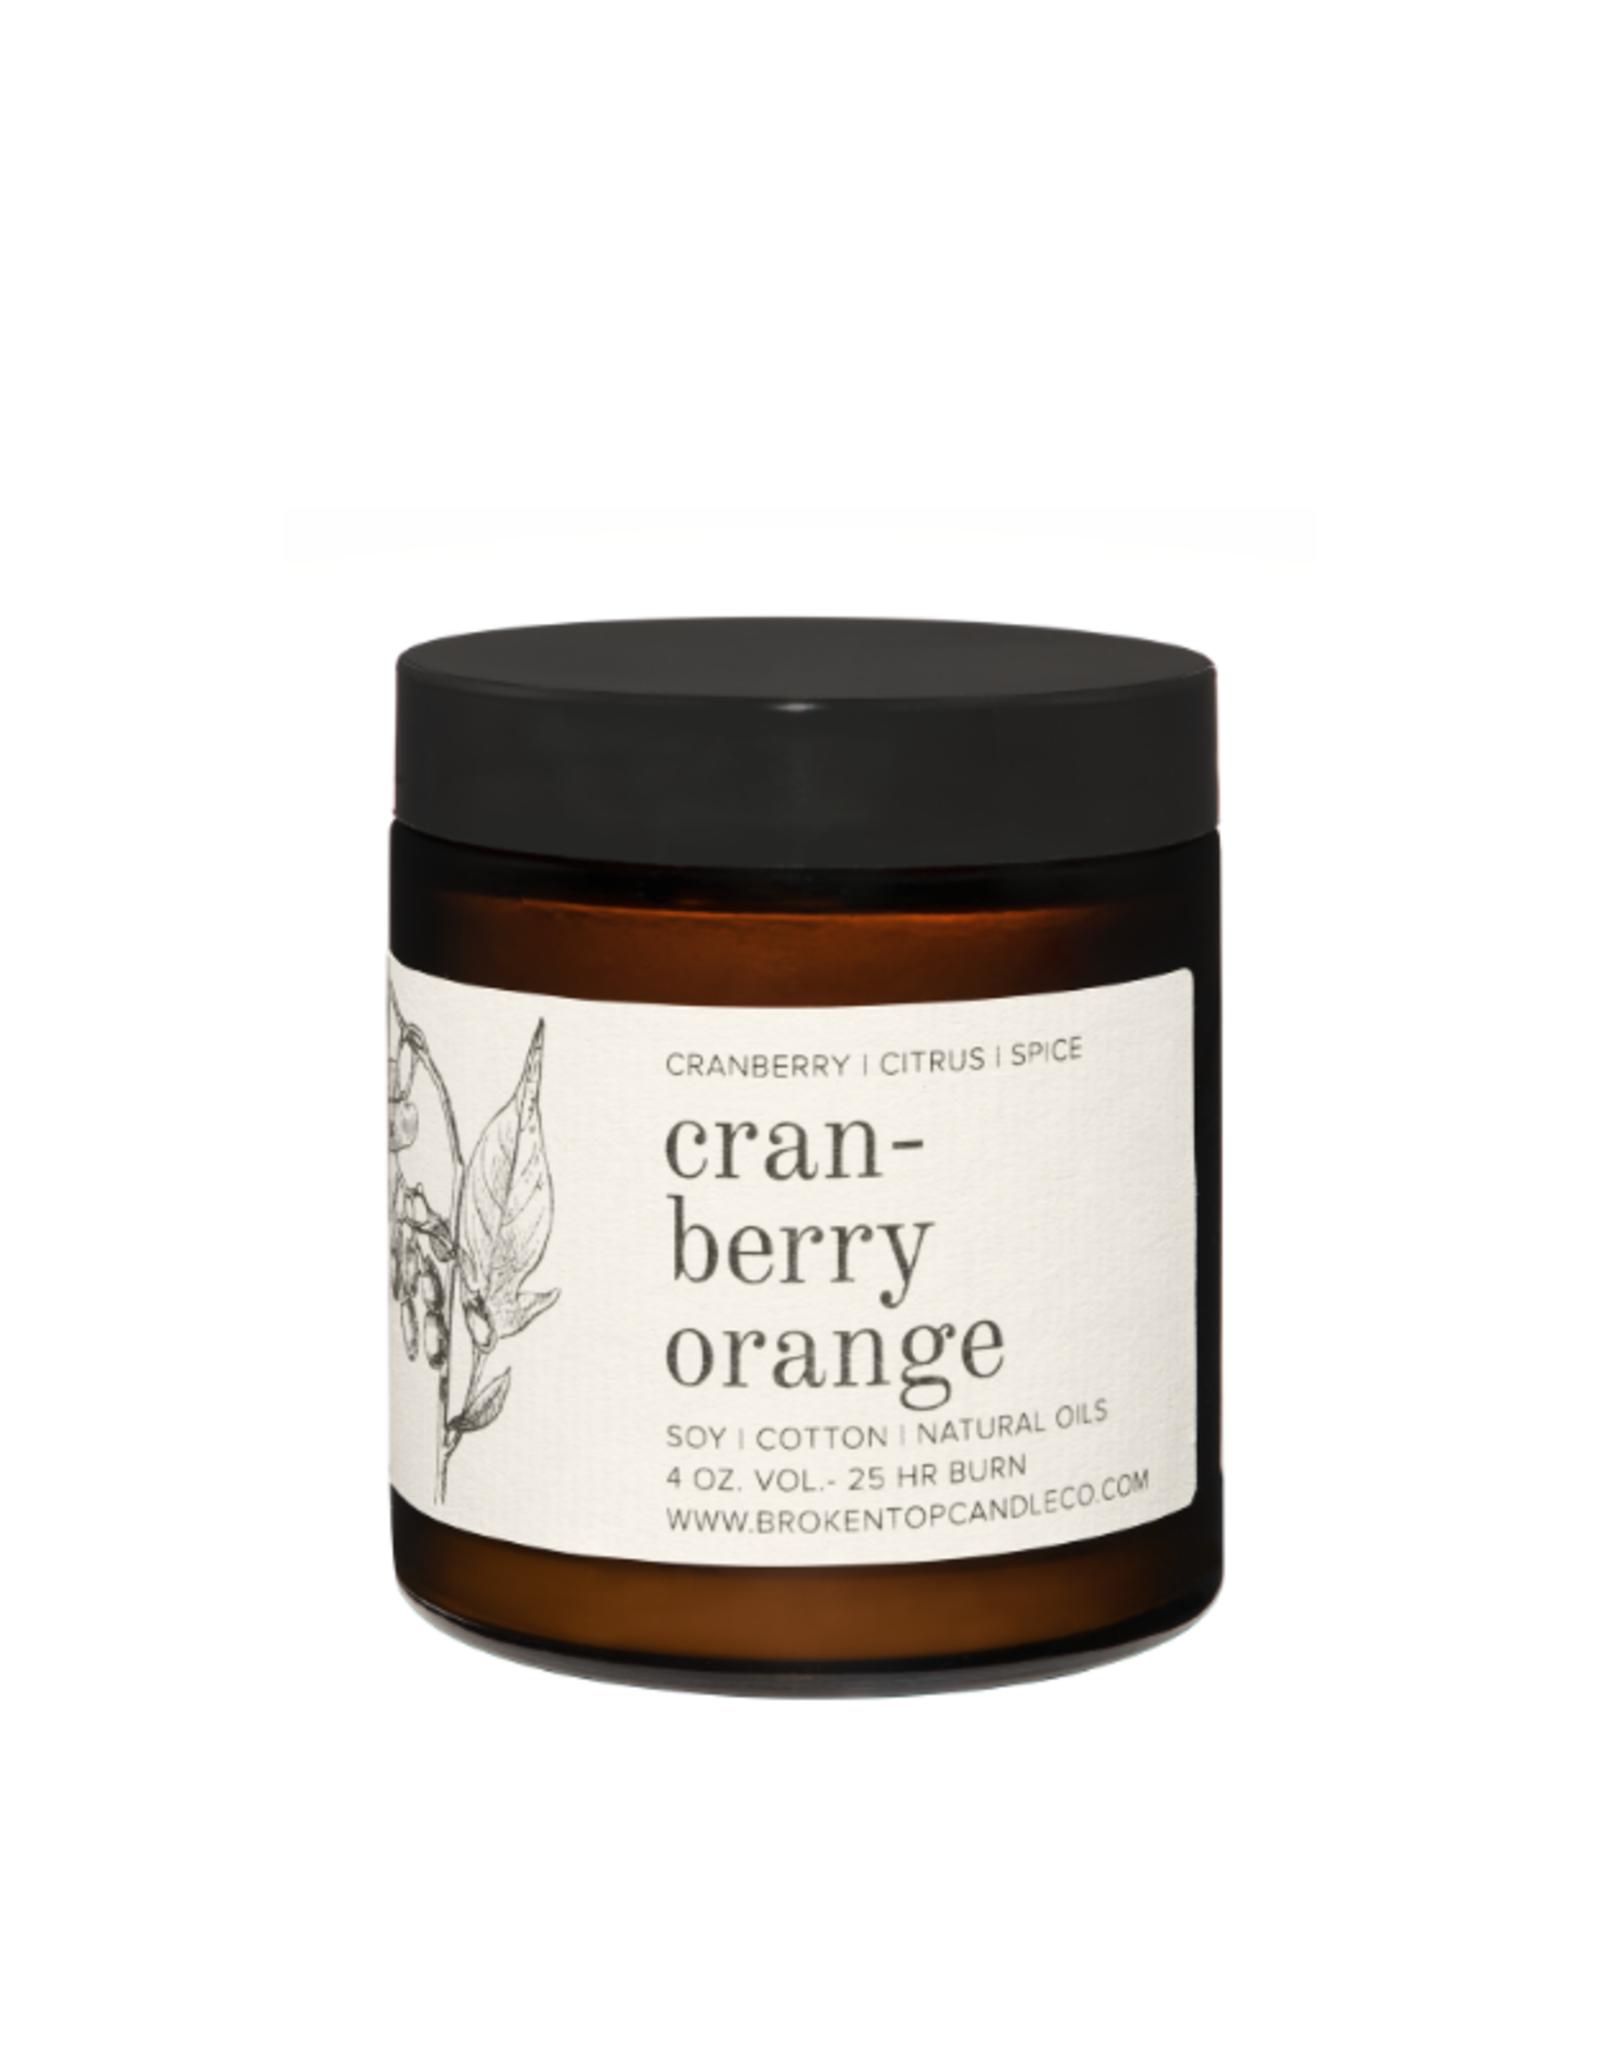 Broken Top Candle Bougie - Cranberry orange - 25h